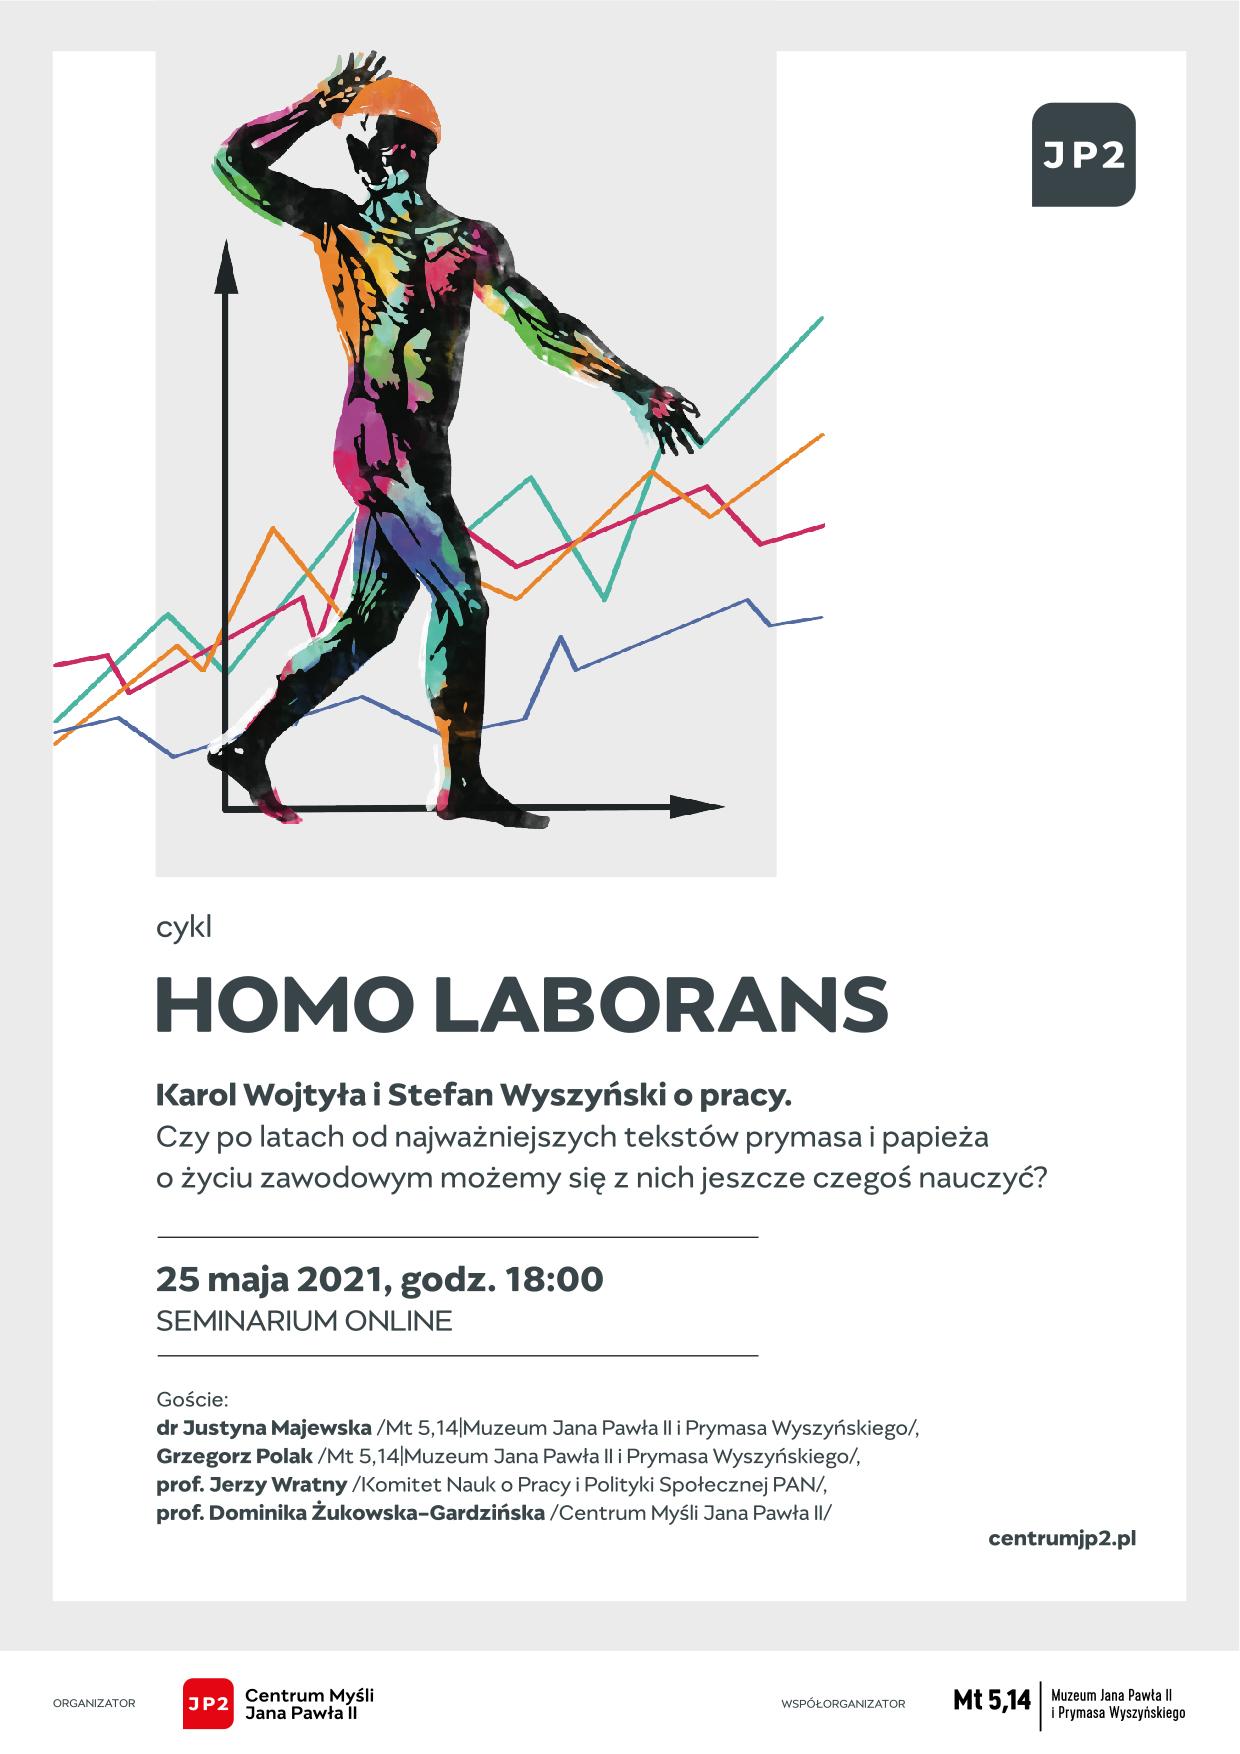 napis homo laborans seminarium online 25 maja 2021 godz. 18